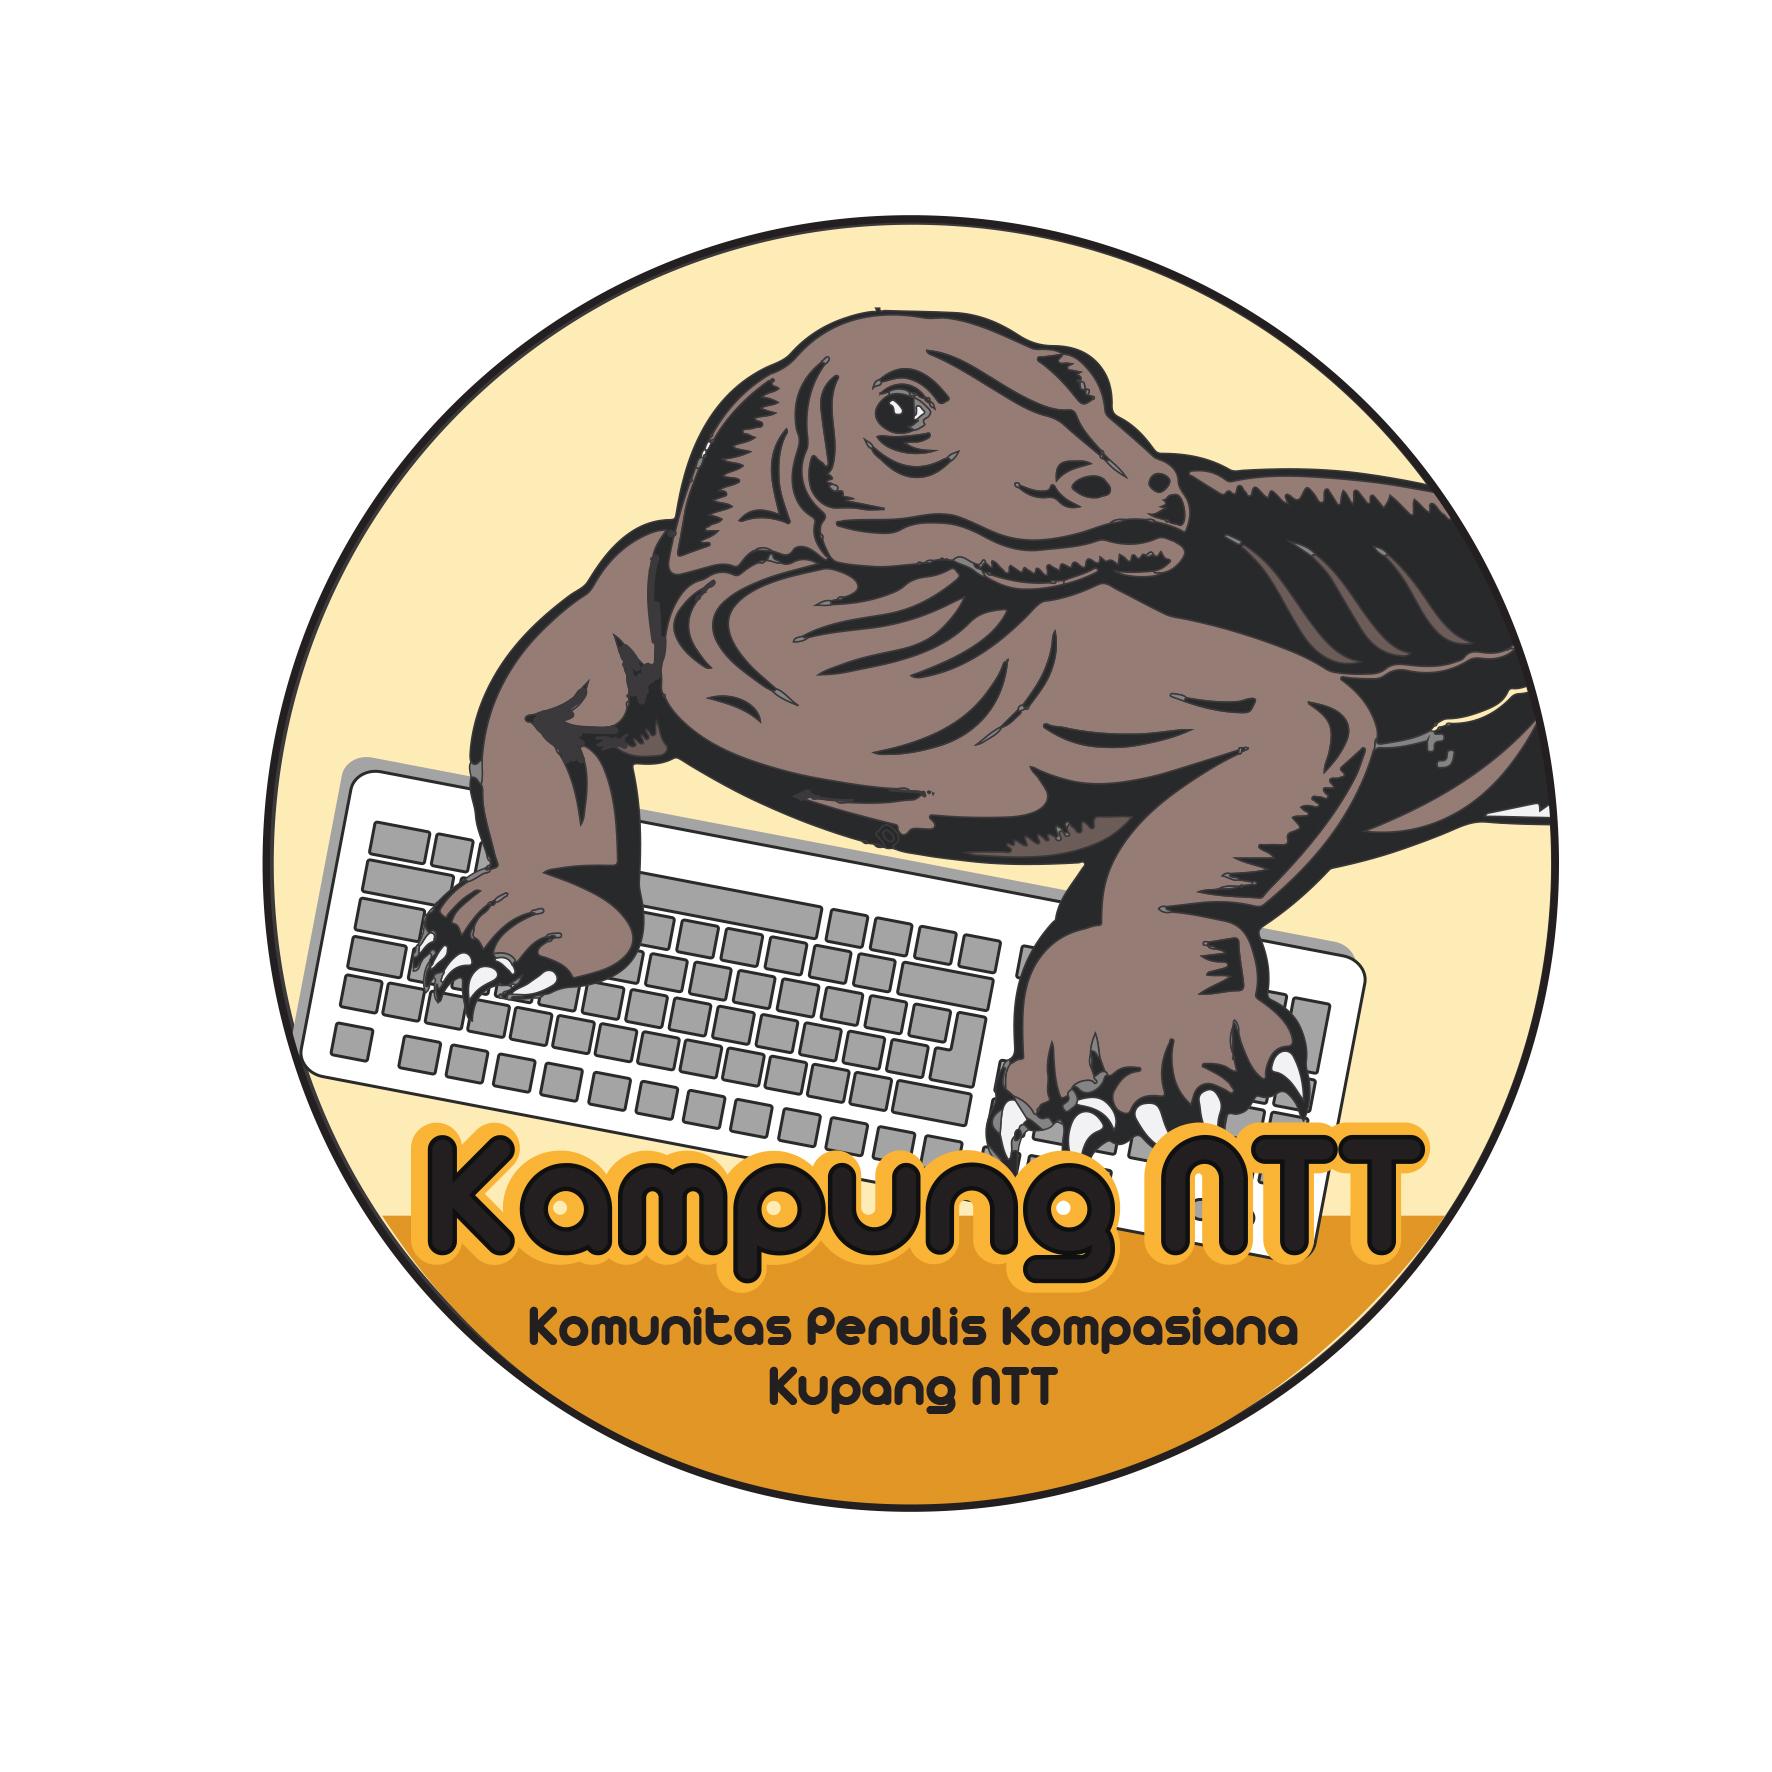 items/kaleidoskop_2019/31-kampung-ntt-1577688869.jpg